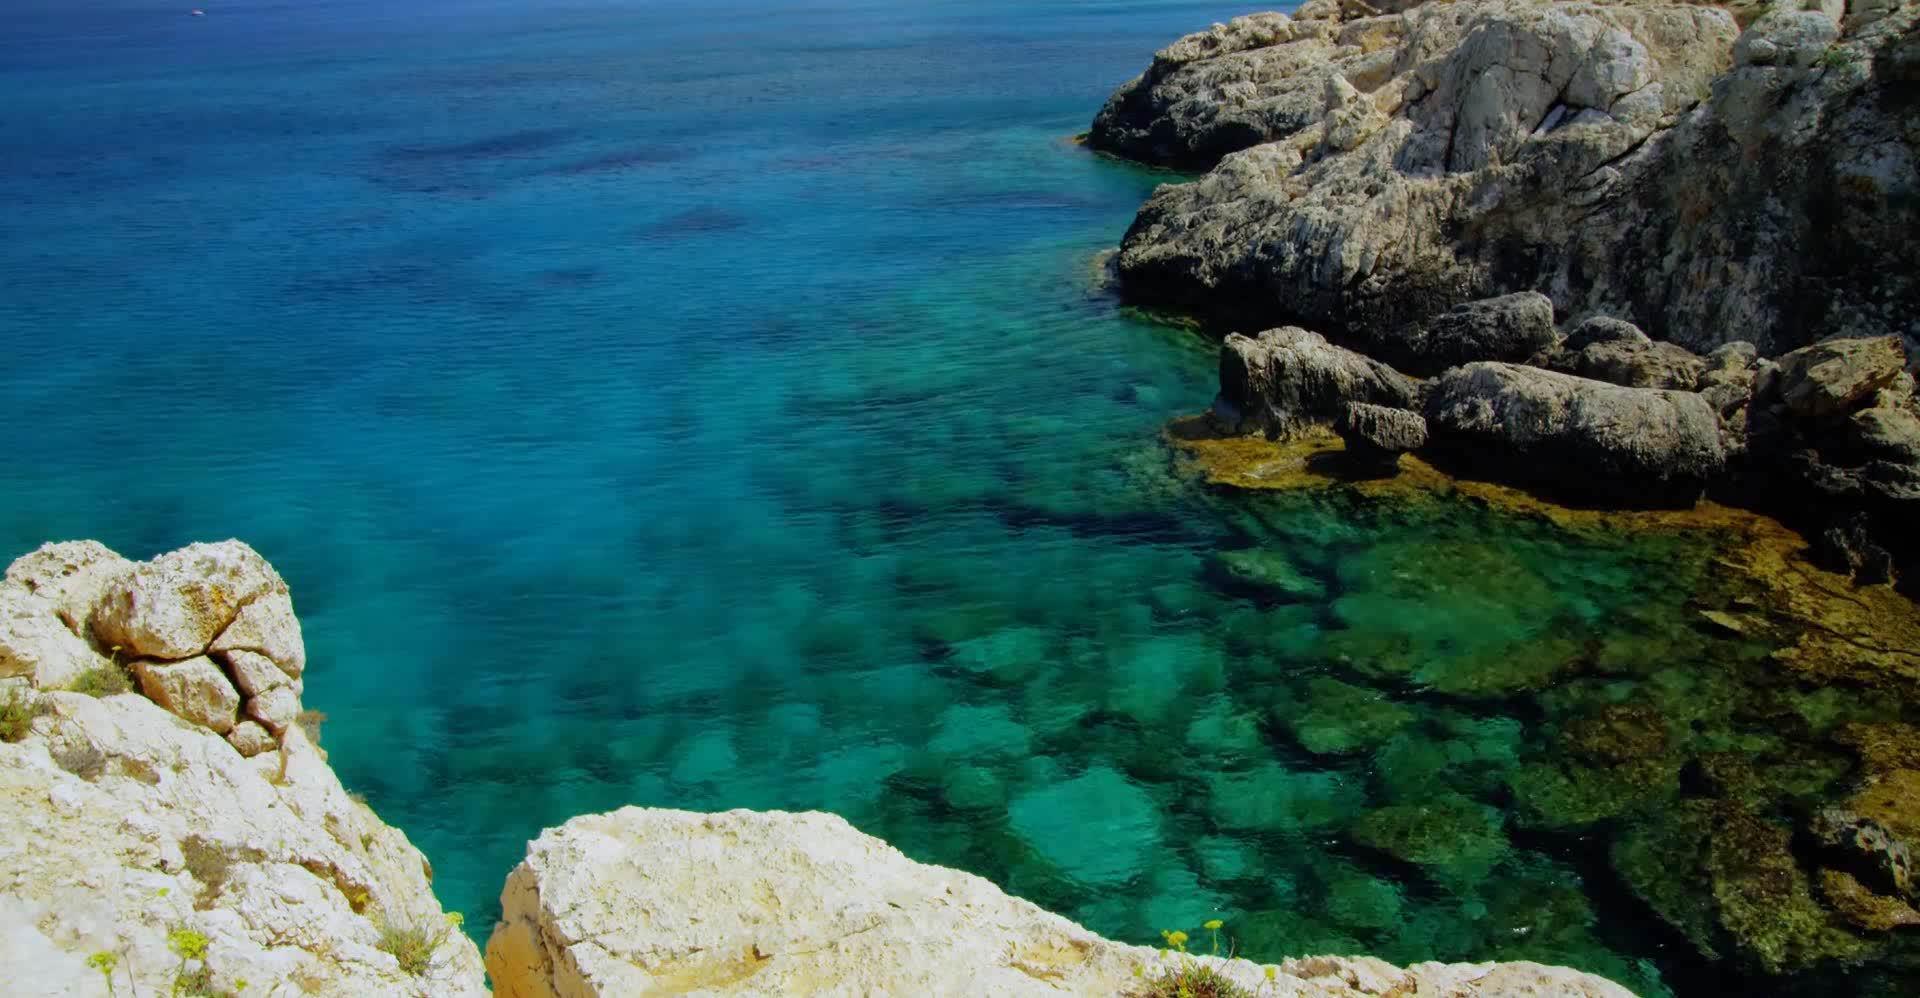 Cyprus Coast BigMurph26 GfycatDepot GIFs